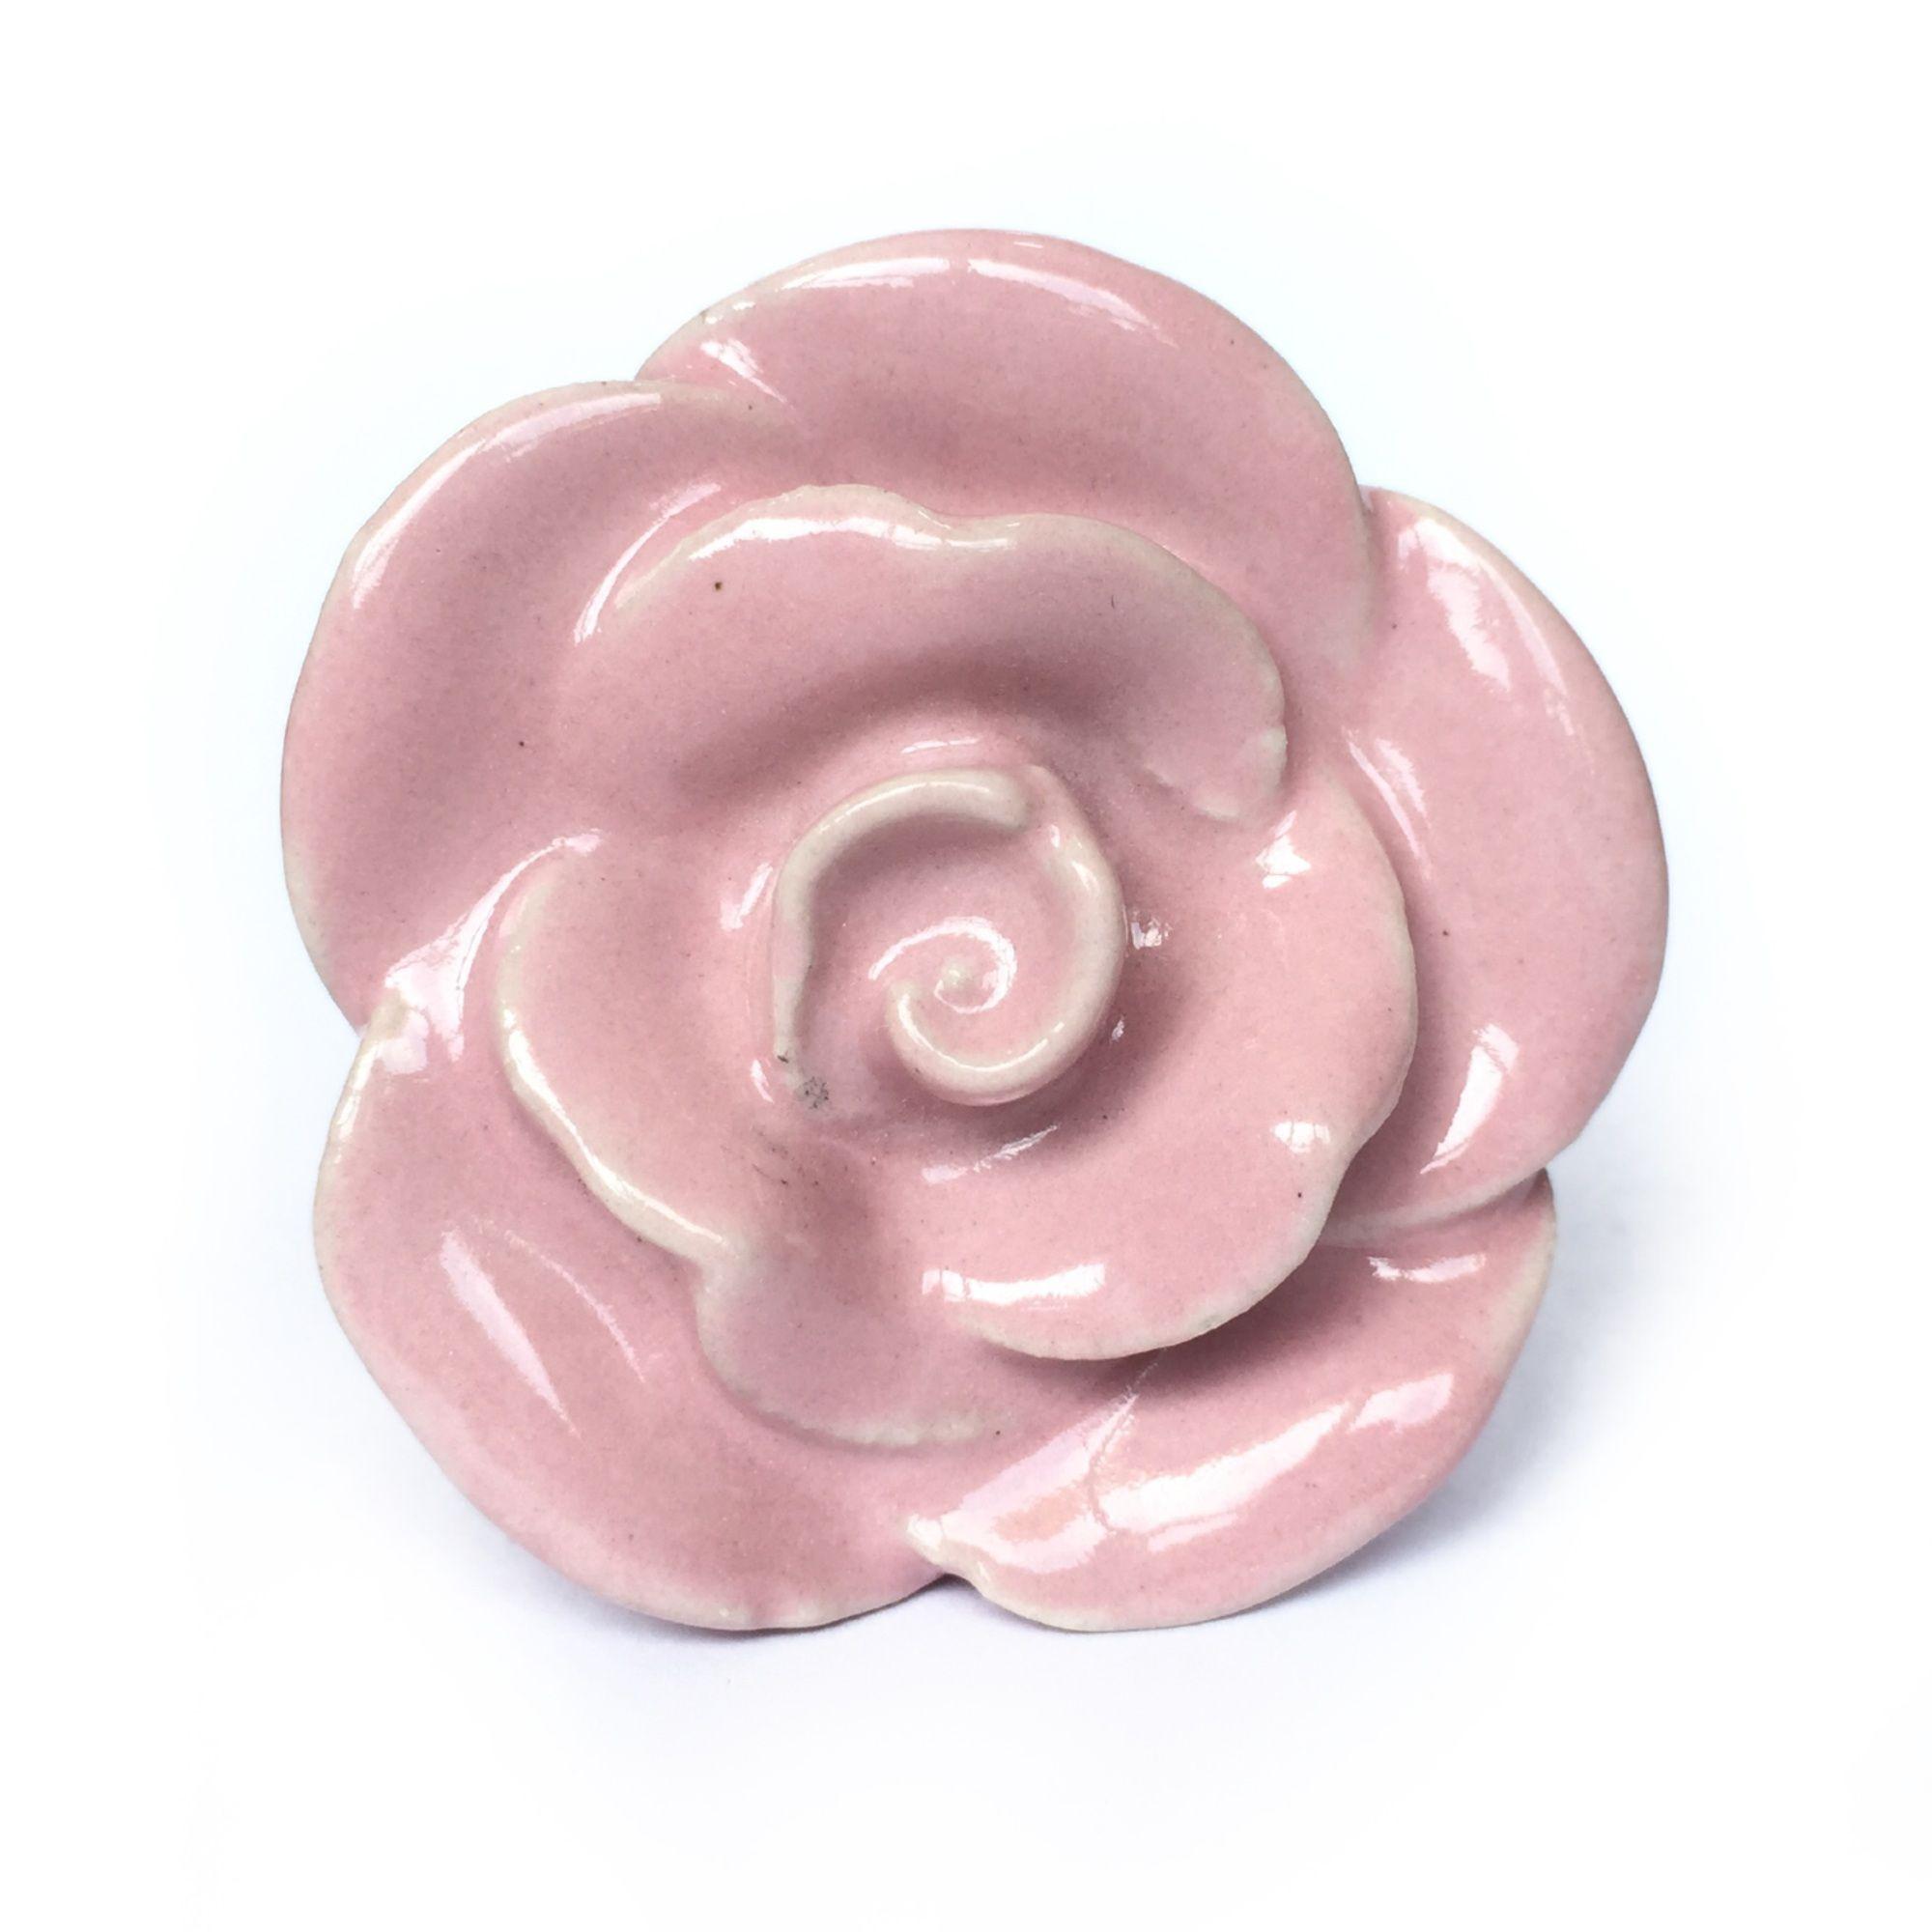 Puxador de Porcelana Flor Rosa Claro - kit 4 pçs